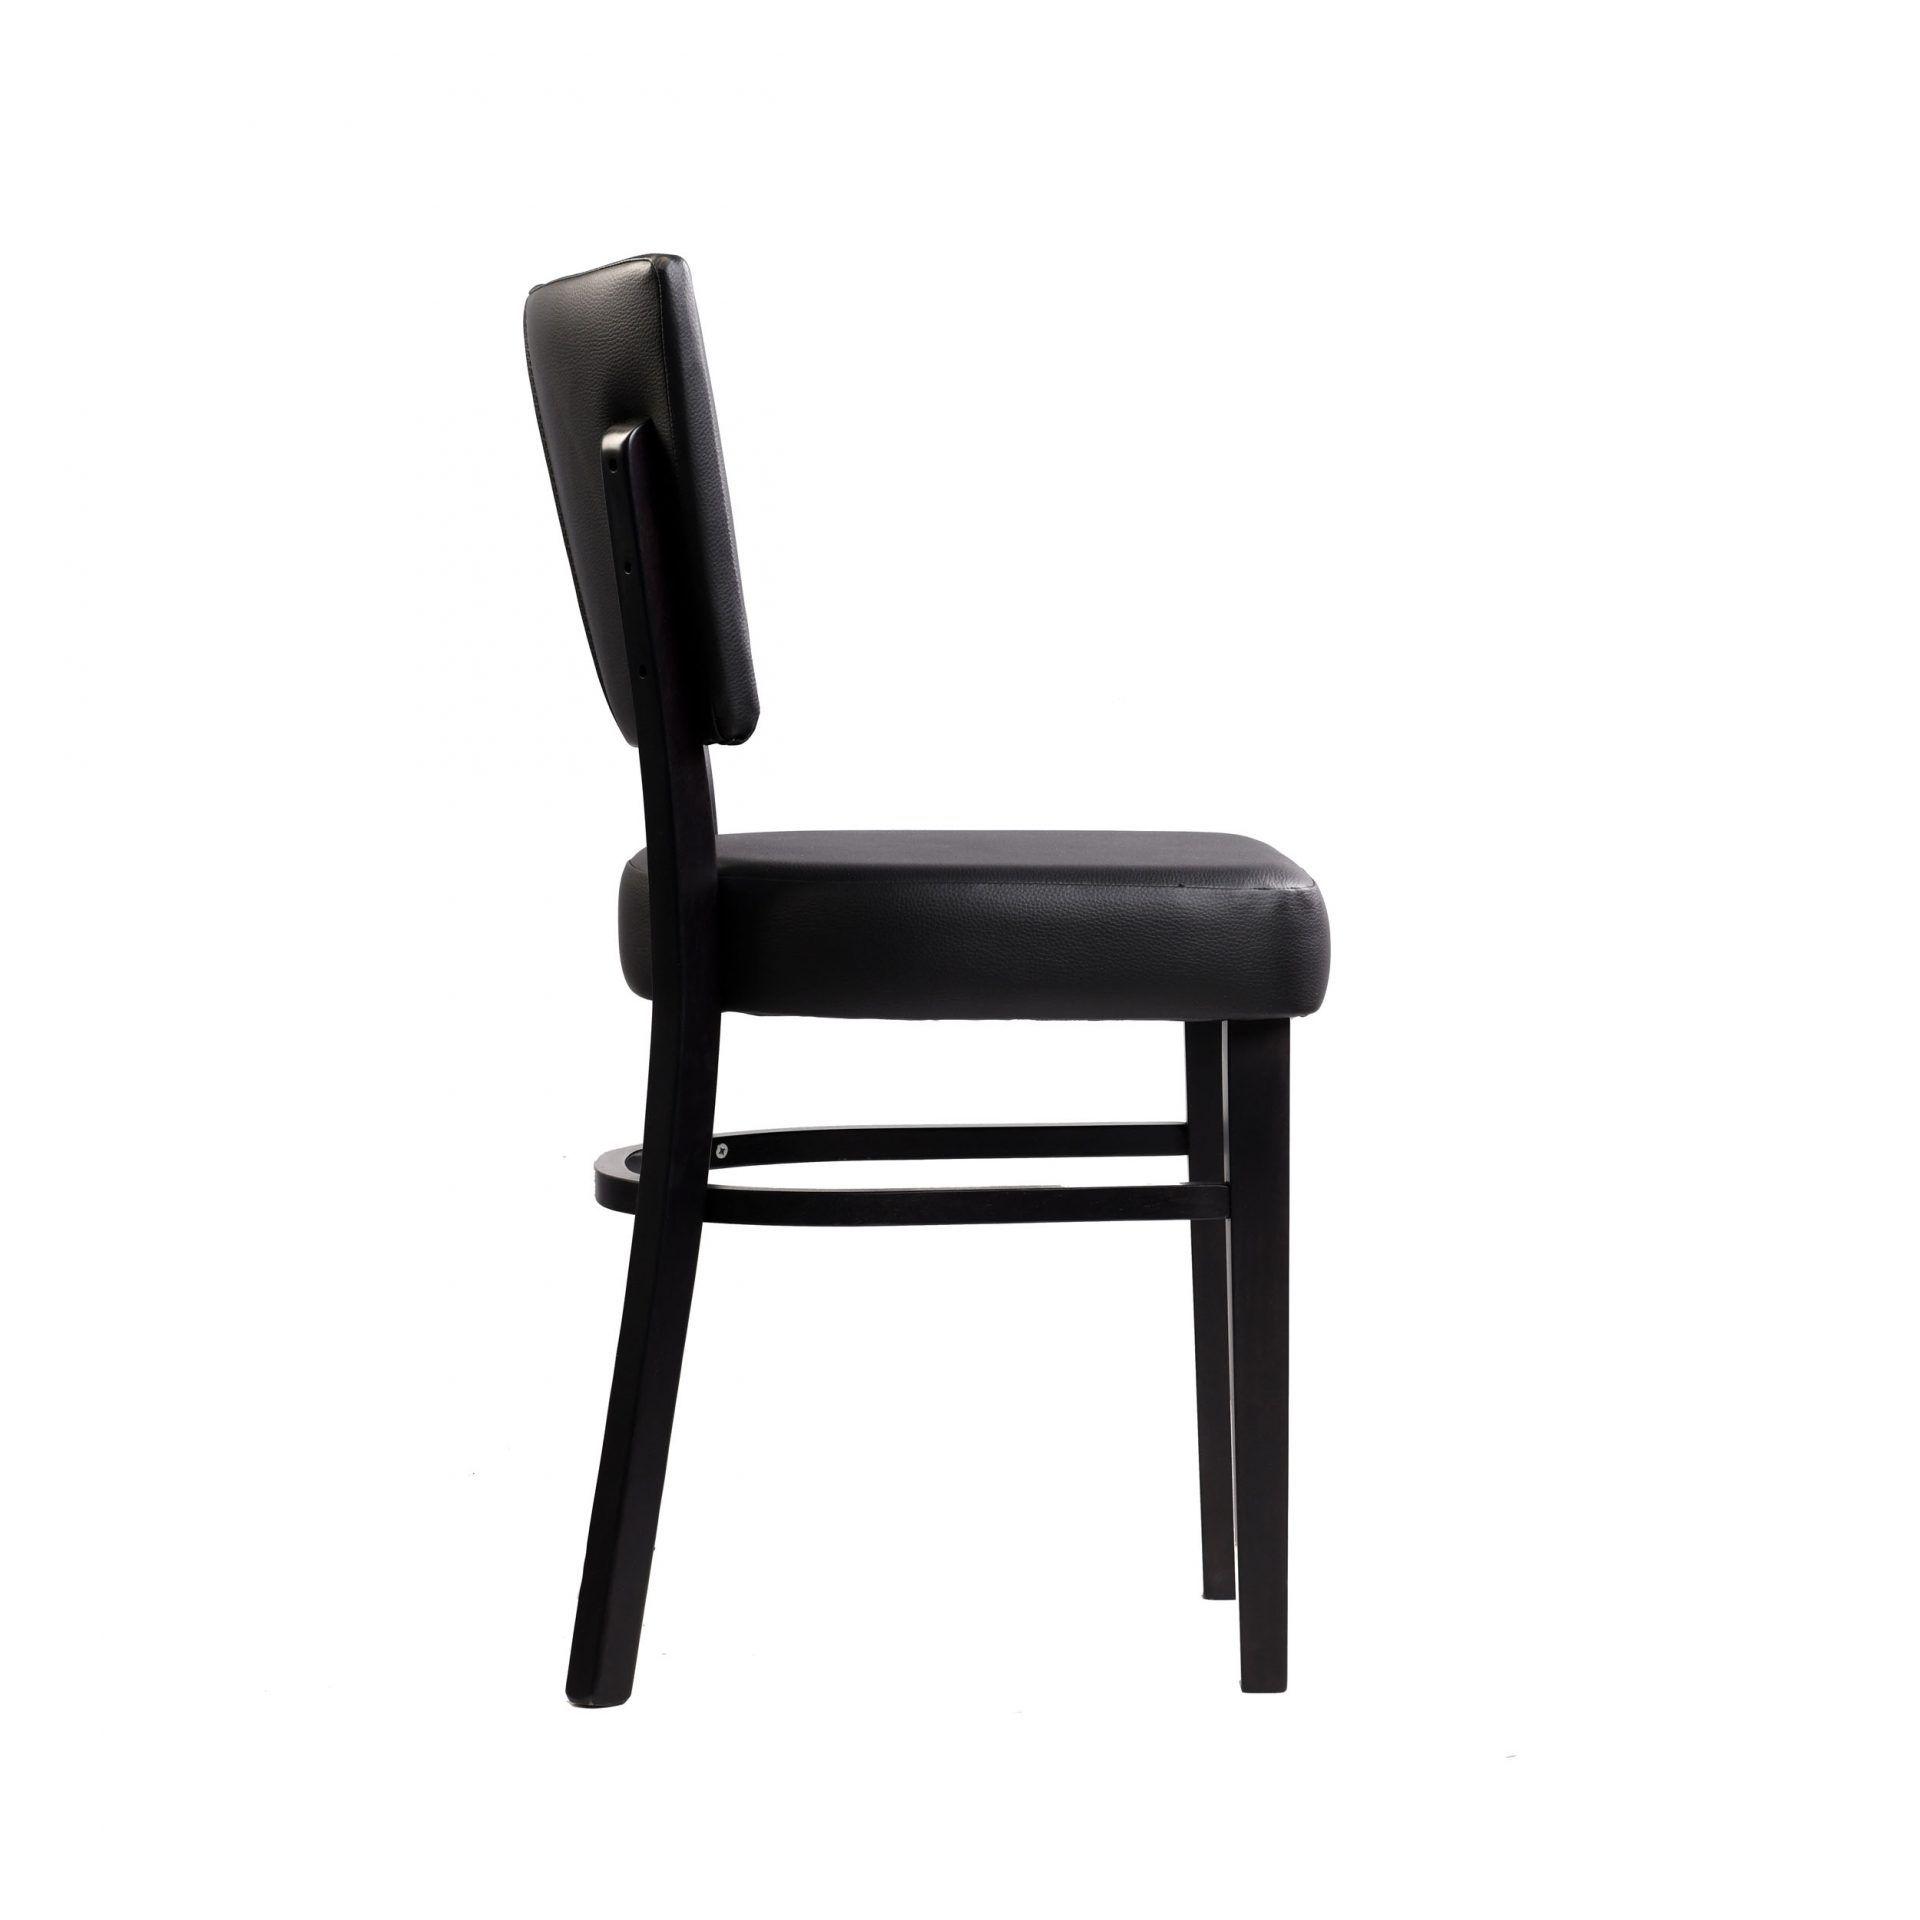 memphis chair black vinyl seat and backrest wenge frame right